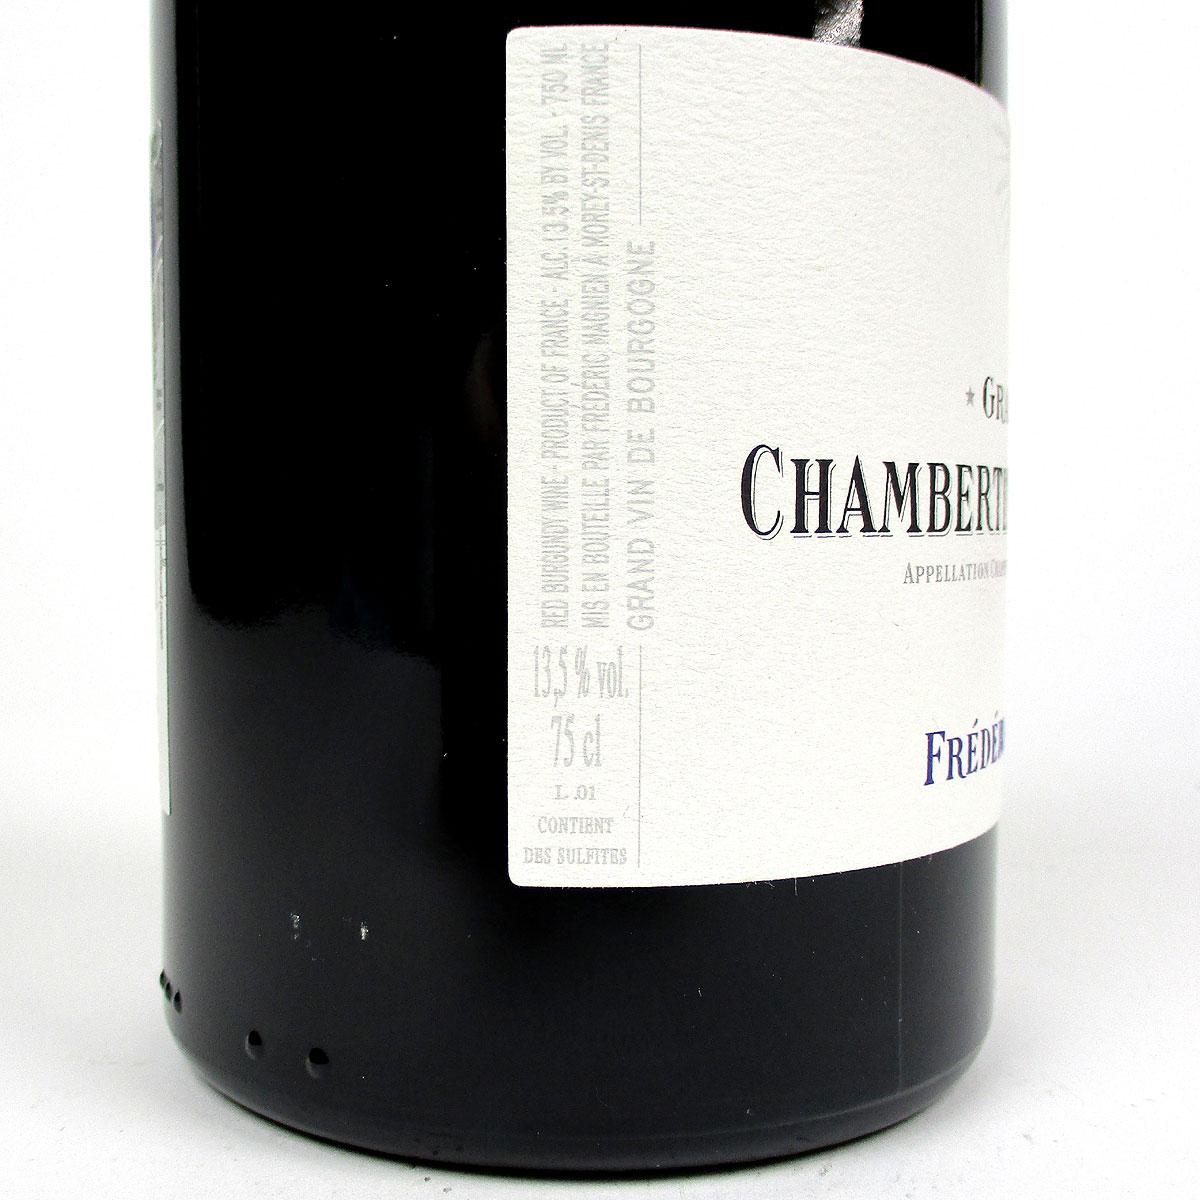 Chambertin-Clos de Bèze: Frédéric Magnien Grand Cru 2017 - Bottle Label Side